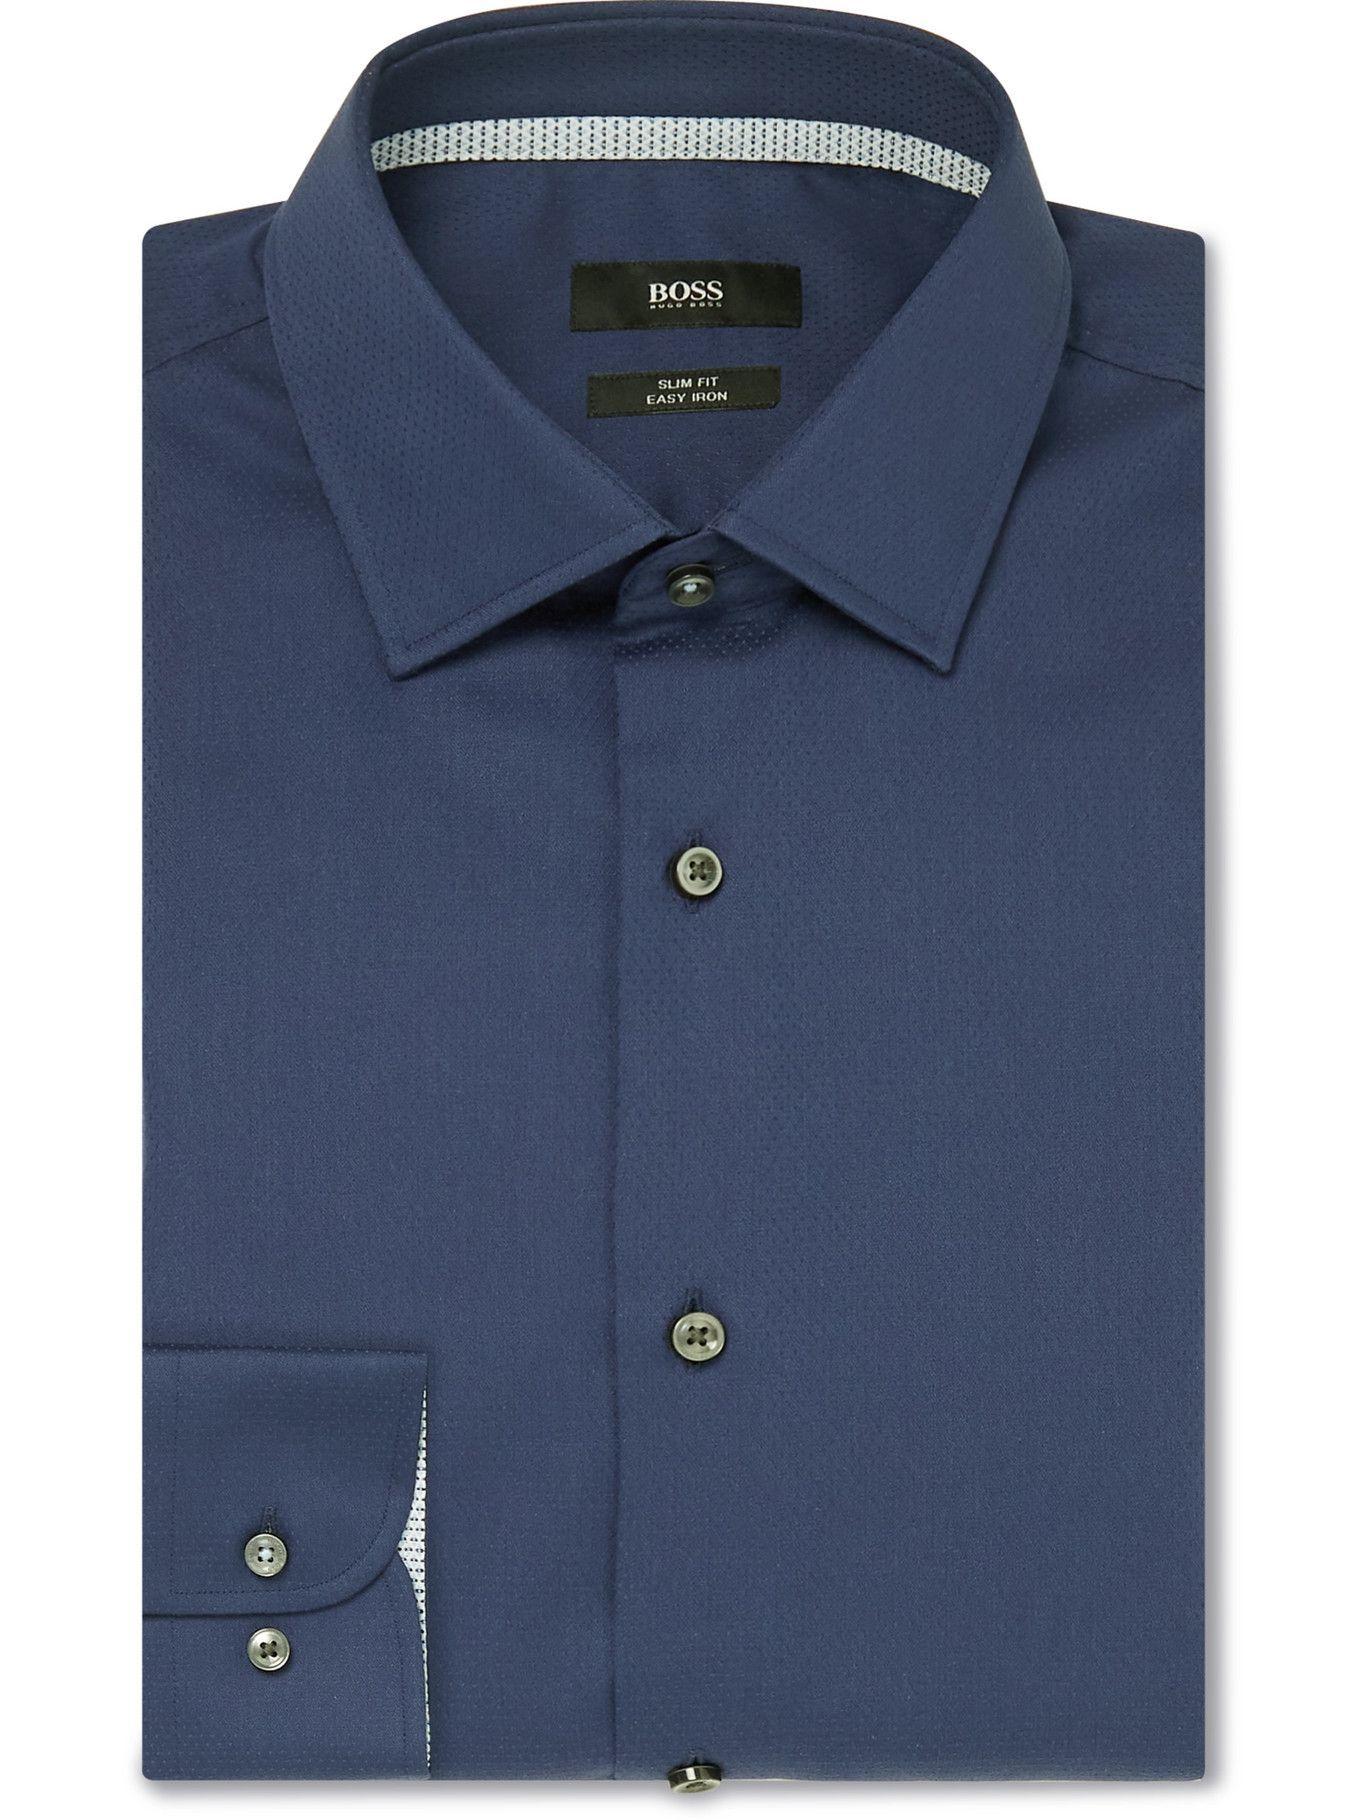 HUGO BOSS - Jesse Slim-Fit Cotton Shirt - Blue